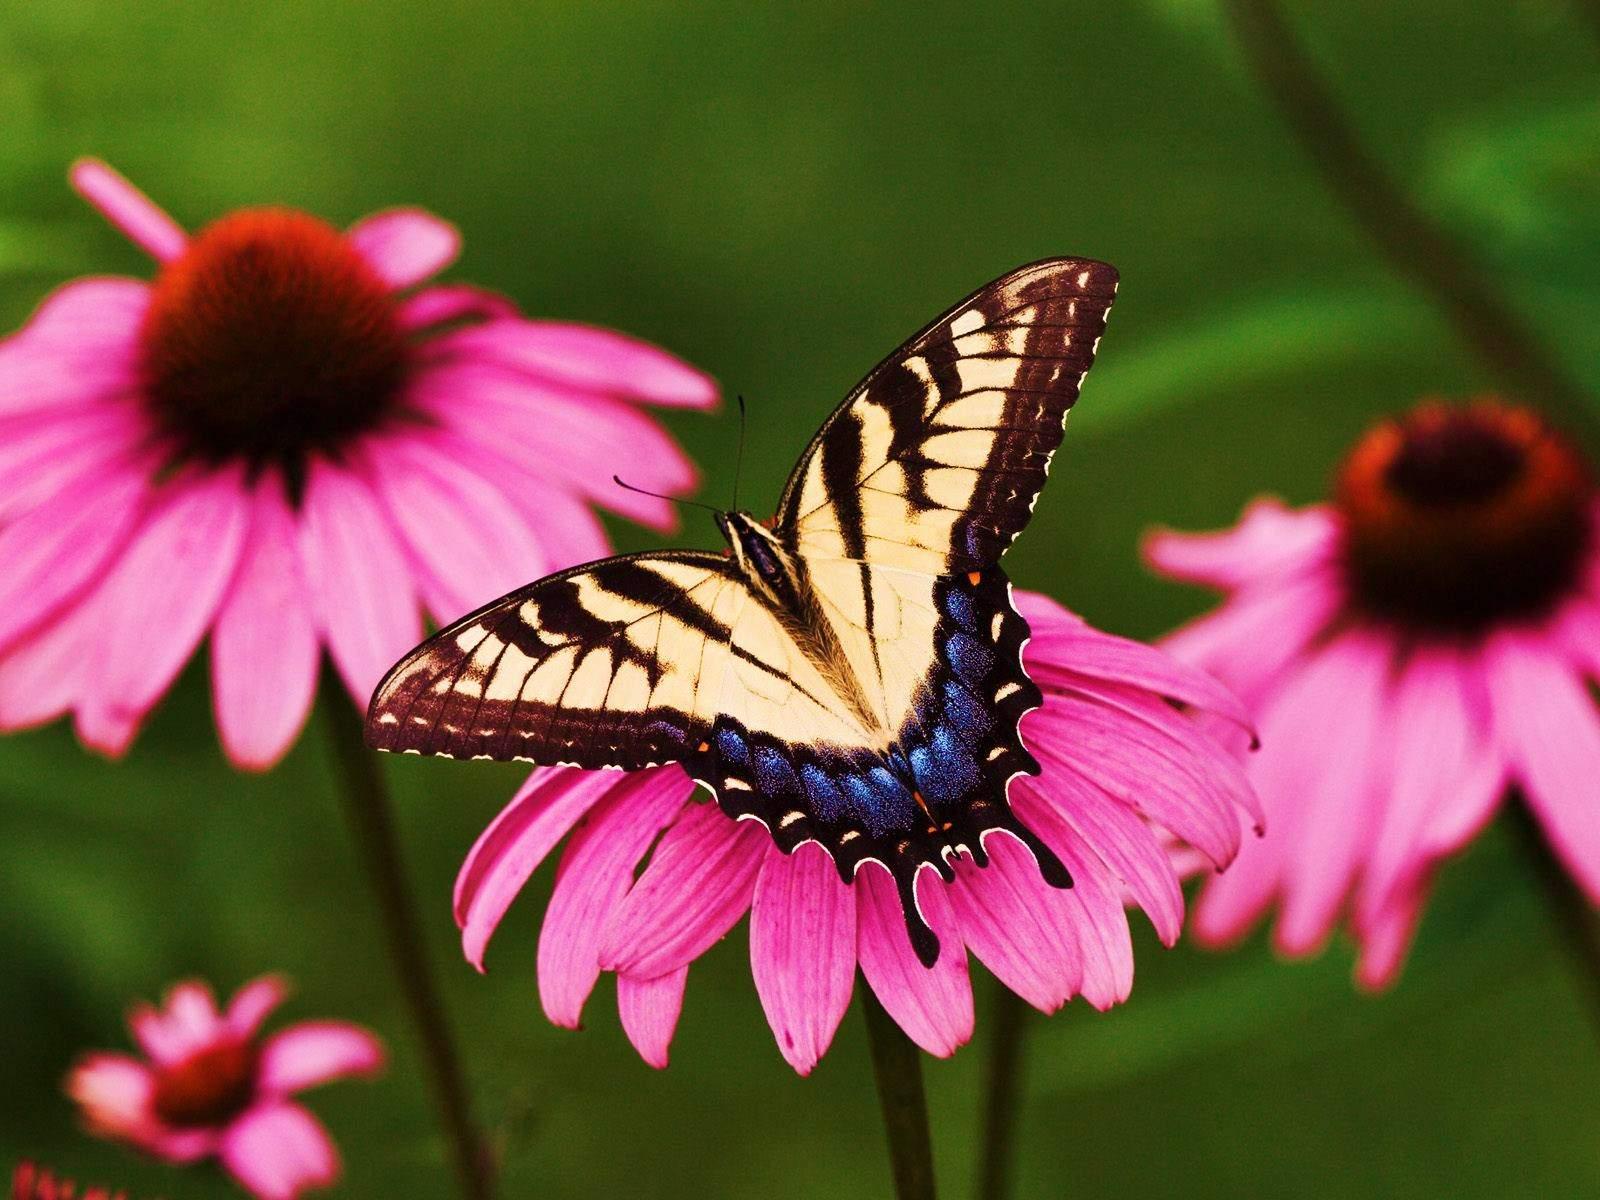 ... flower lovers.: Flowers butterfly natural beauty desktop wallpapers